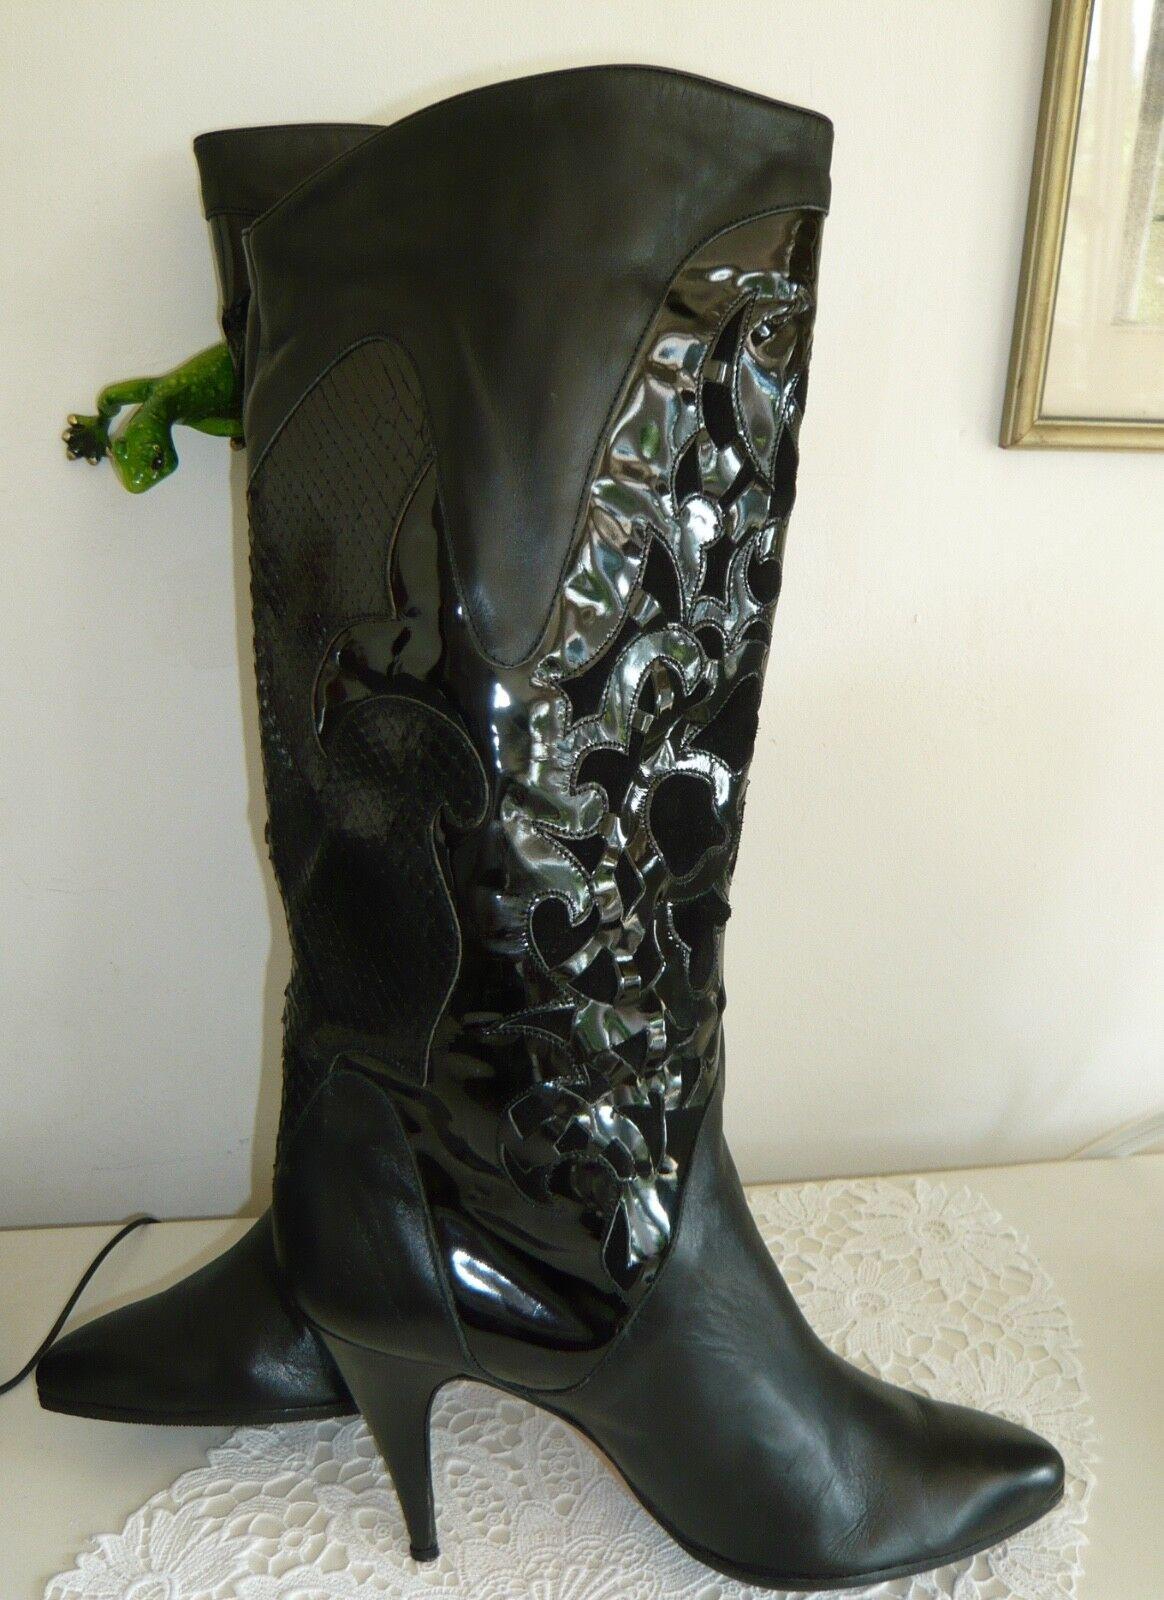 ITALIANA liscio-VERNICE-Serpenti ORIG. VINT. Stivali liscio-VERNICE-Serpenti ITALIANA Pelle Nero Mis. 39,5-40 d4b14e